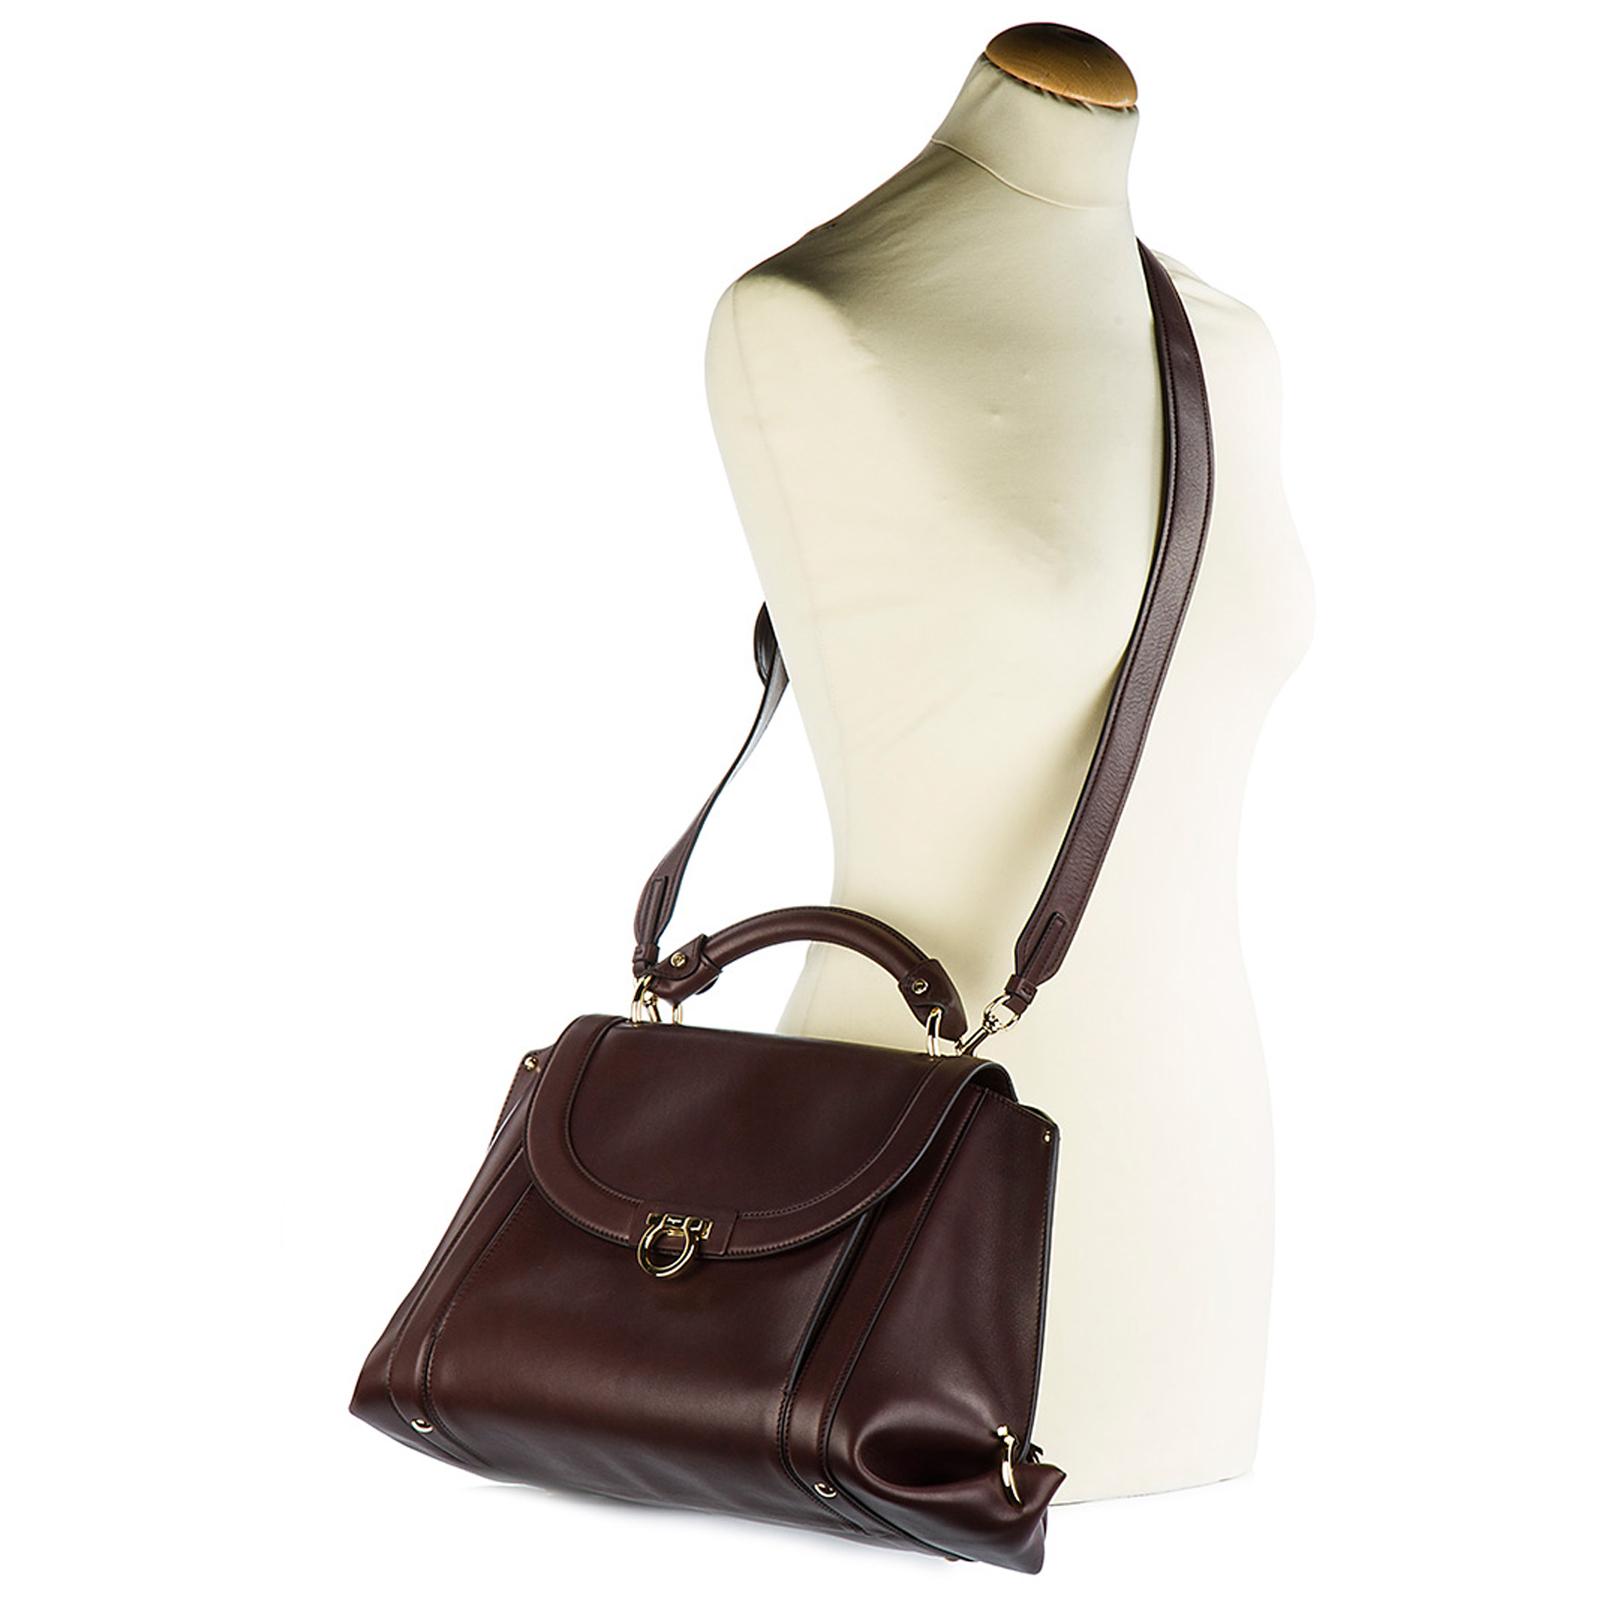 c58531b692 ... Women s leather handbag shopping bag purse soft sofia ...